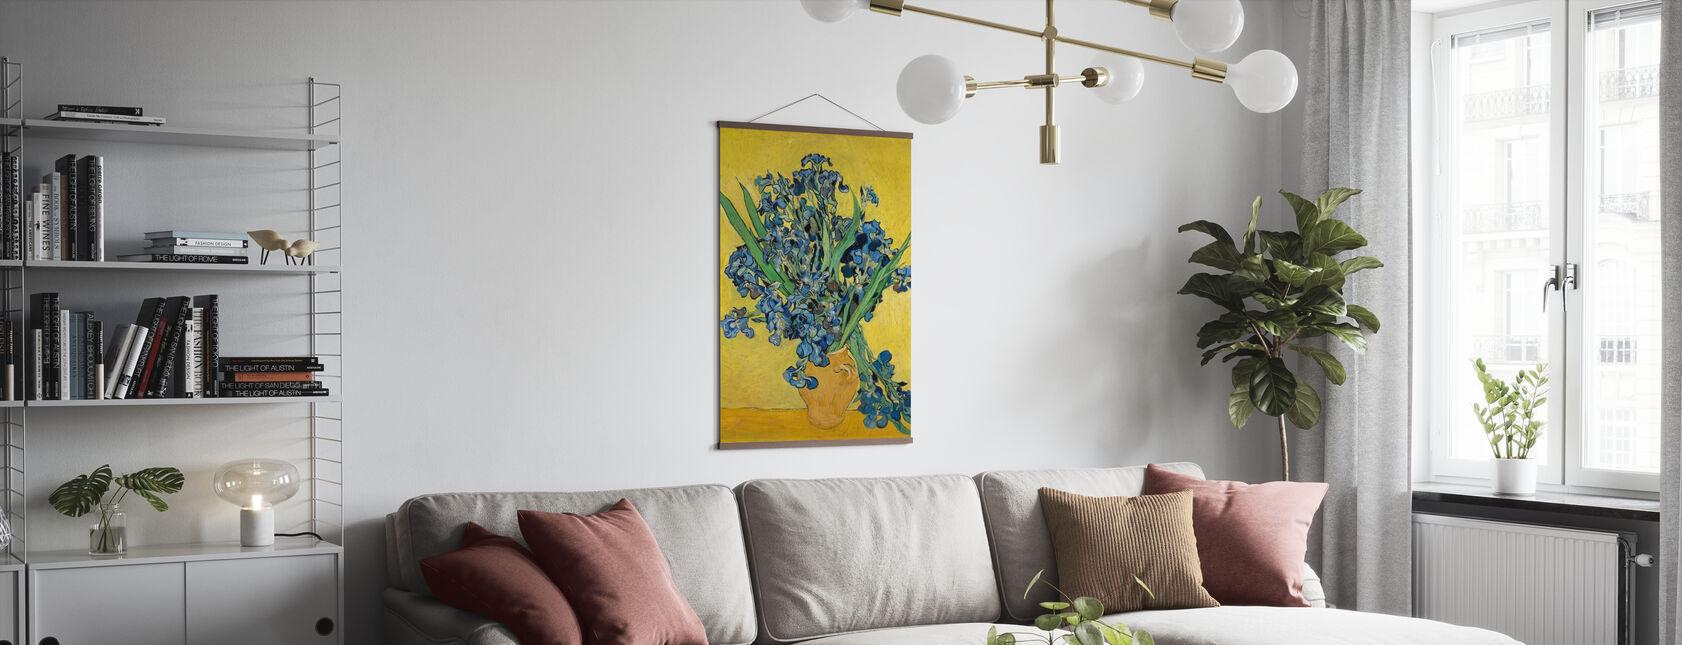 Iris - Vincent Van Gogh - Affiche - Salle à manger